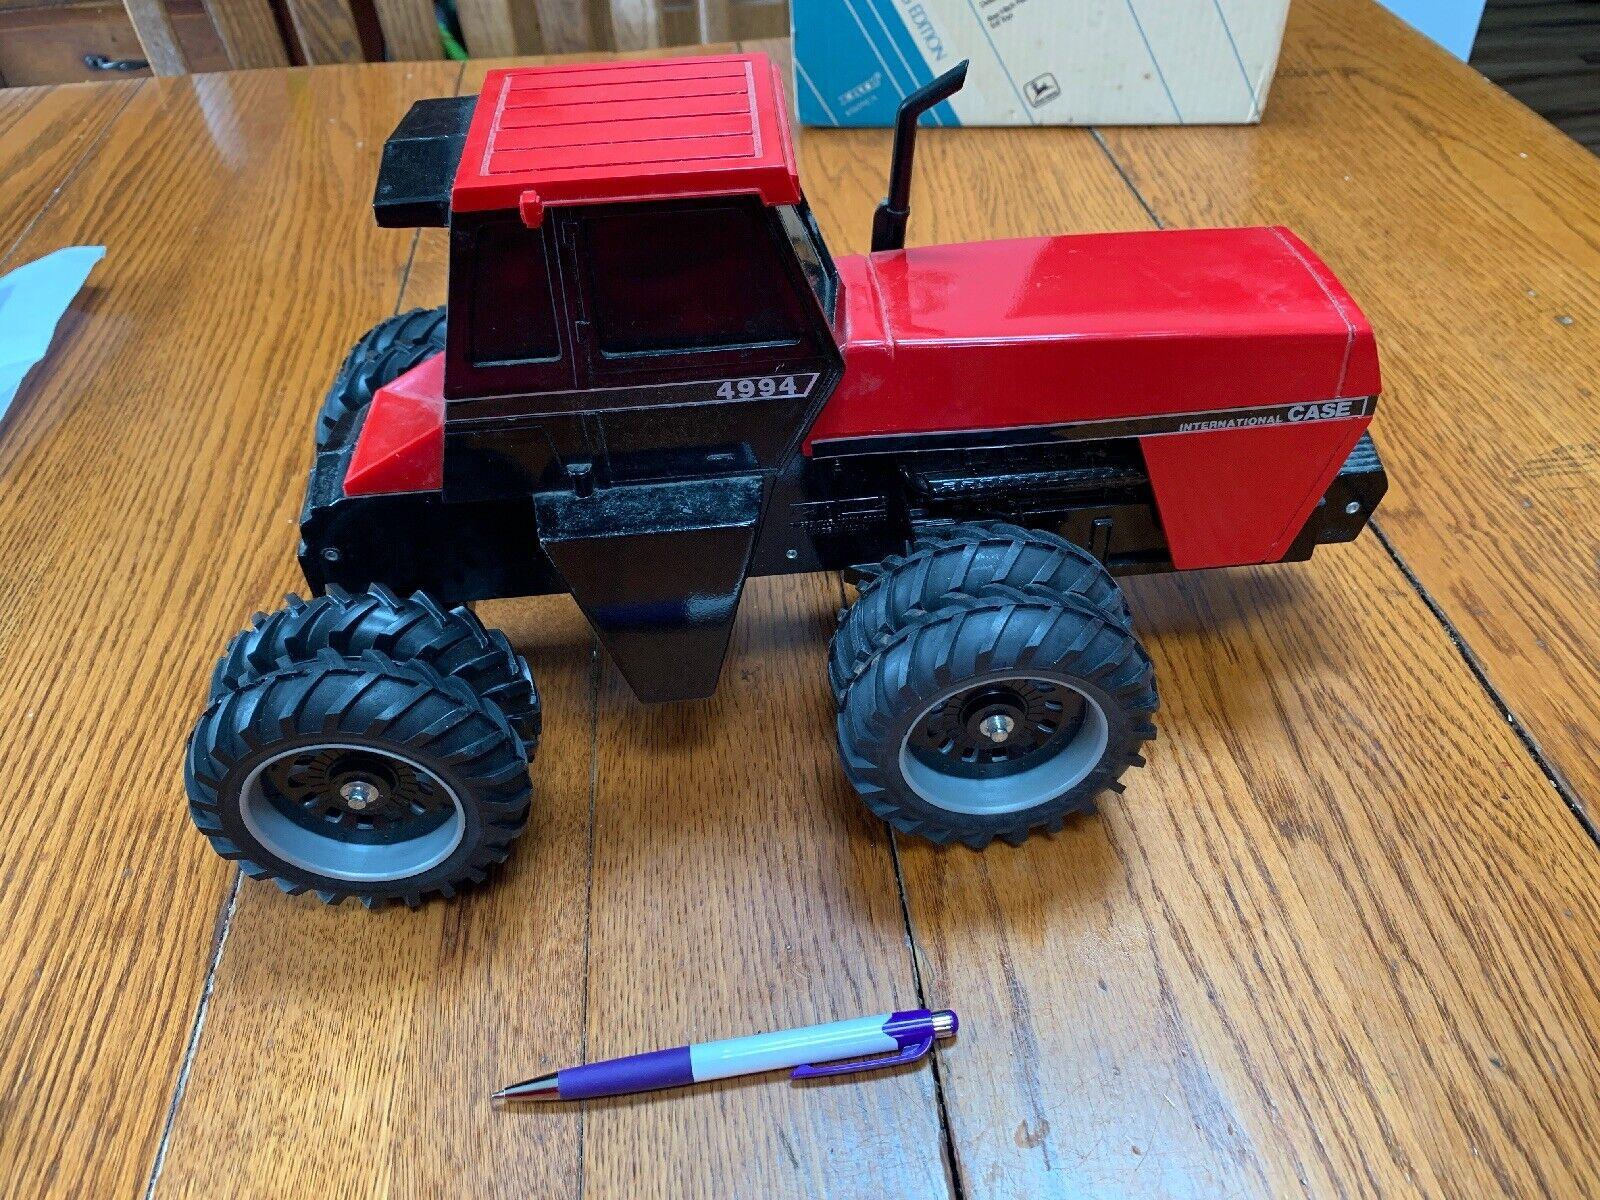 1 16 ERTL DIE-CAST 4994 CASE INTERNATIONAL 4-wheel Drive Tracteur années 1980